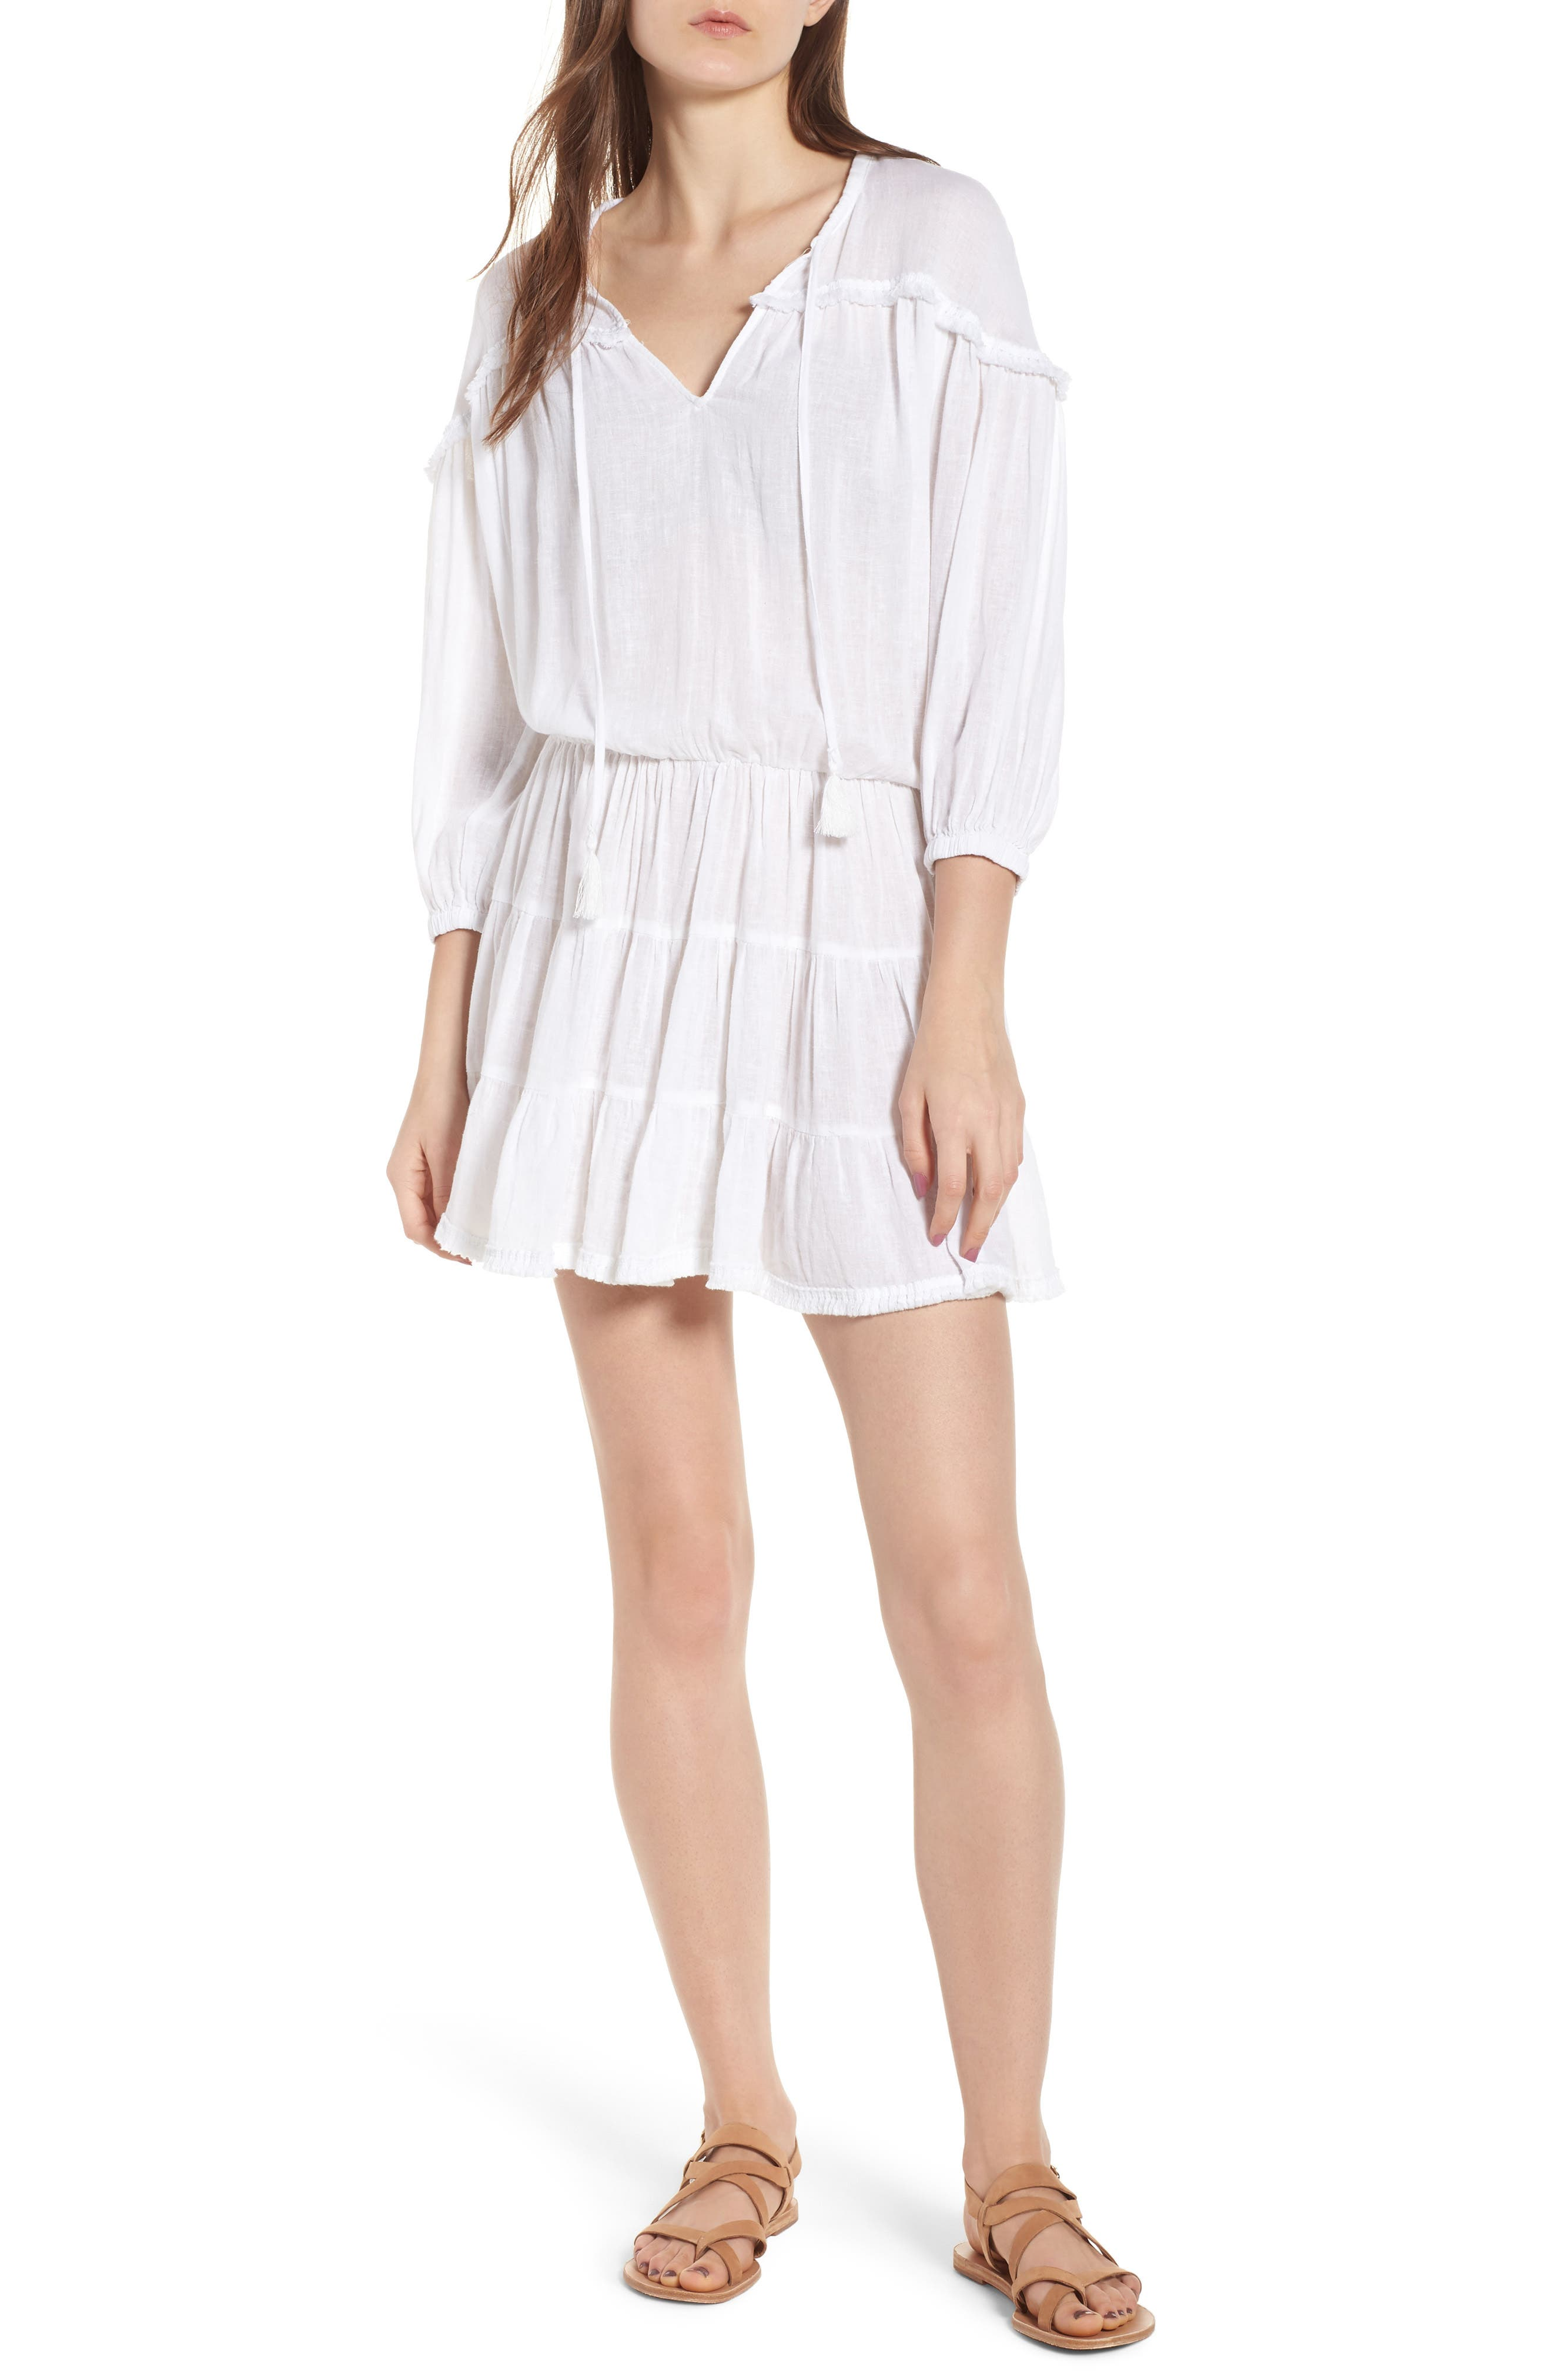 Sansa Minidress,                         Main,                         color, 100